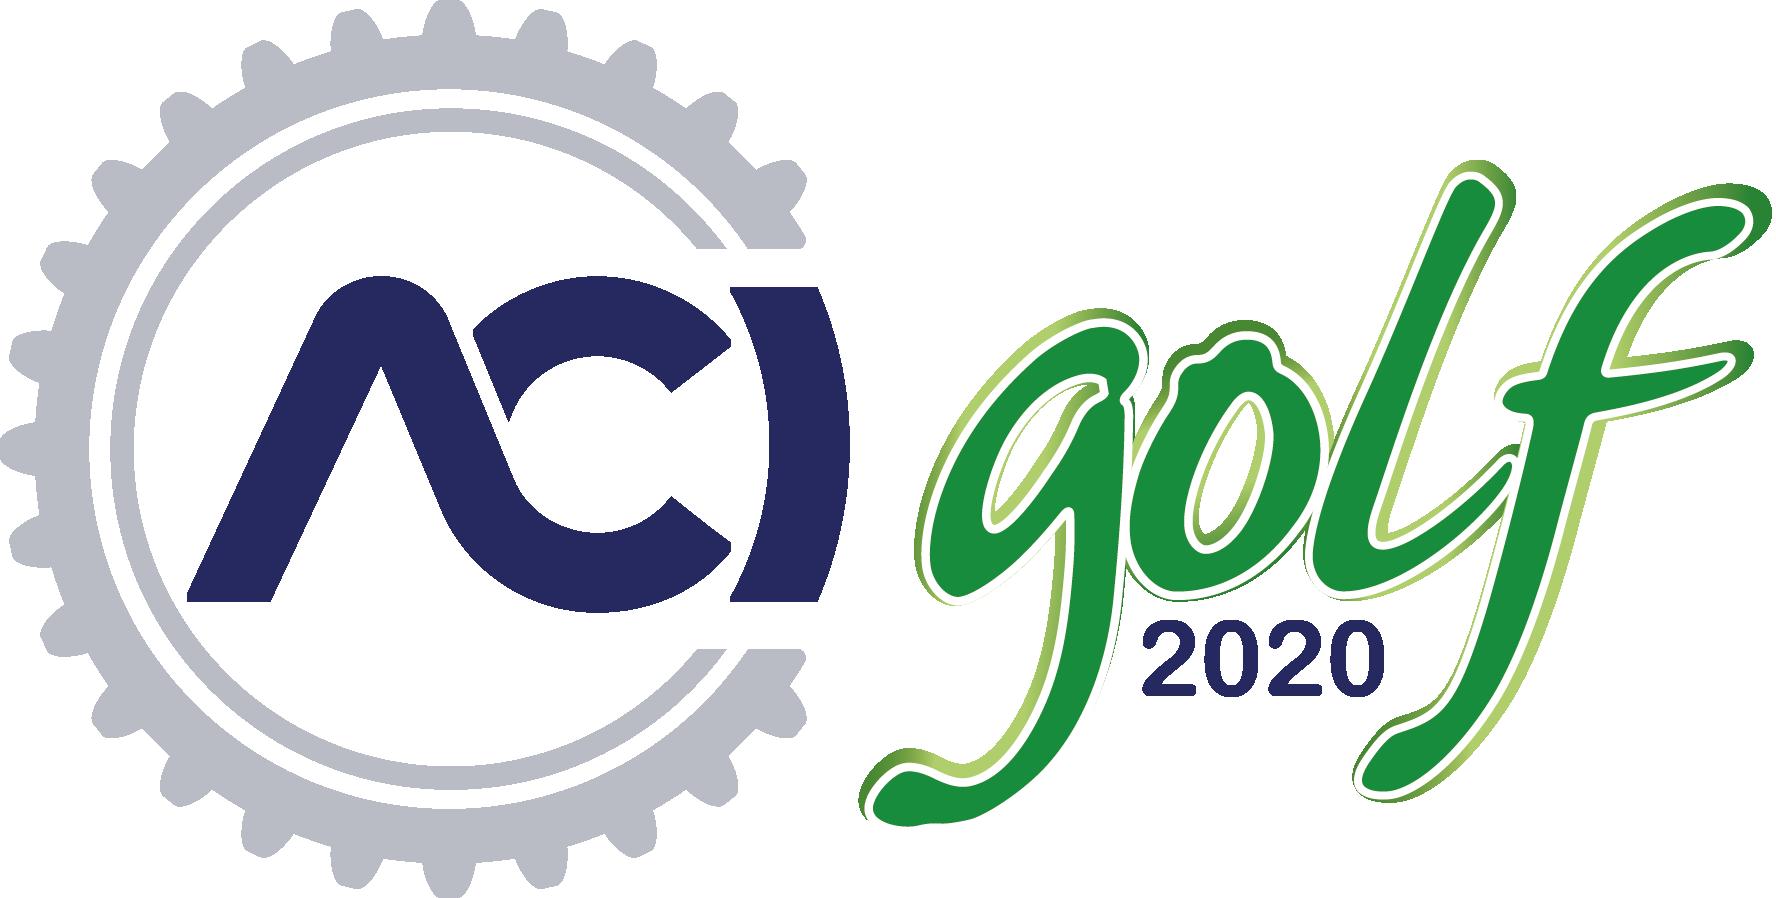 ACI GOLF 2020 AciGolfRuota 2020 01